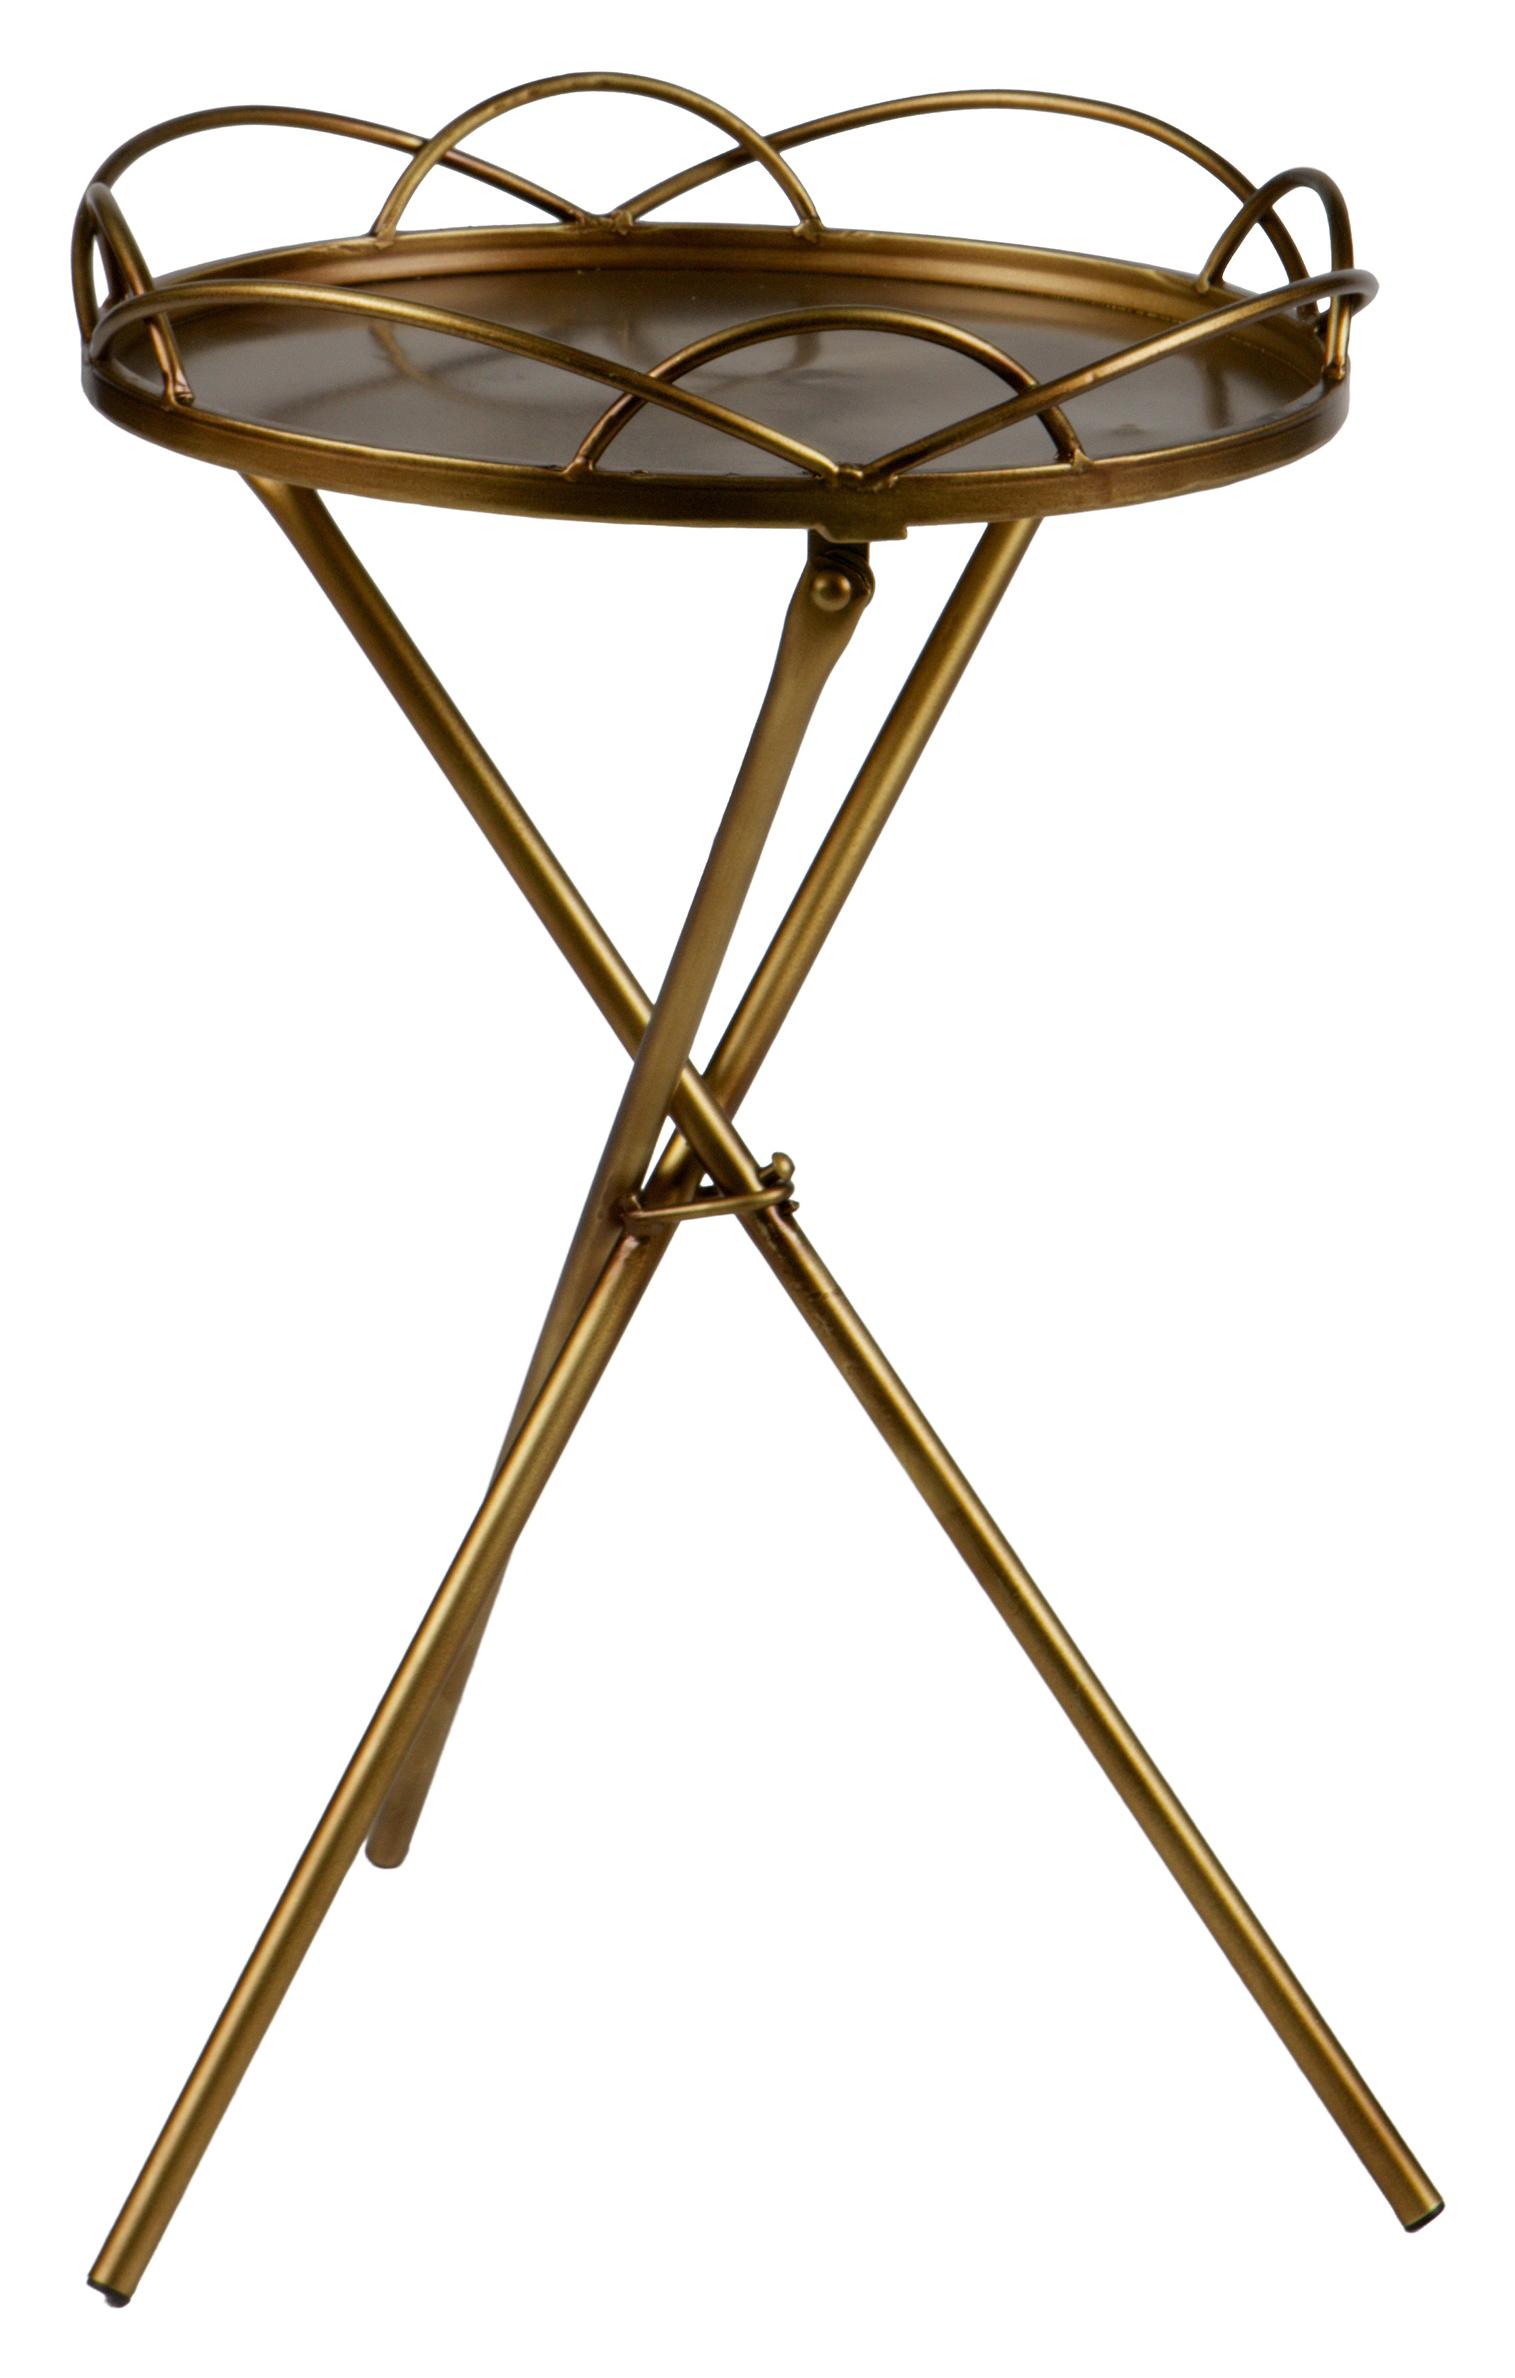 BePureHome Bijzettafel 'Filmy' 36cm, kleur Antique Brass Tafels | Bijzettafels kopen